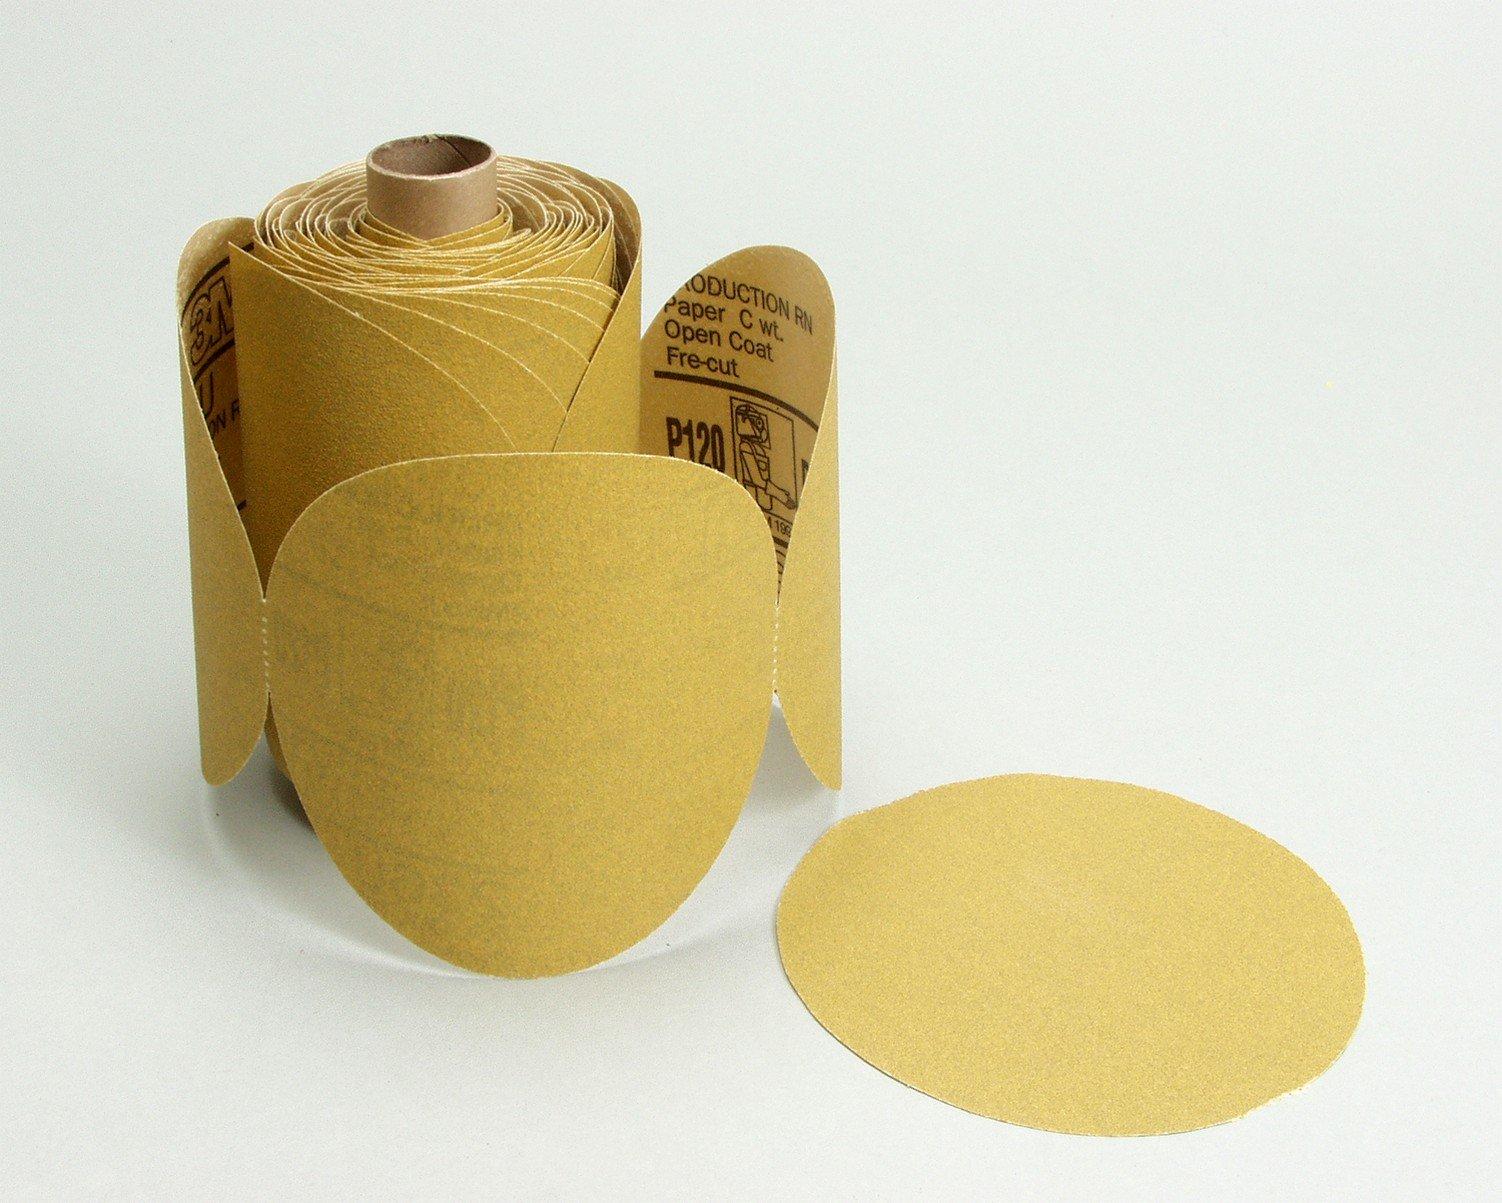 3M(TM) Stikit(TM) Paper Disc Roll 236U, C-weight, Pressure-Sensitive Adhesive (PSA) Attachment, Aluminum Oxide, 6'' Diameter, P80 Grit, Gold  (Pack of 1) by 3M